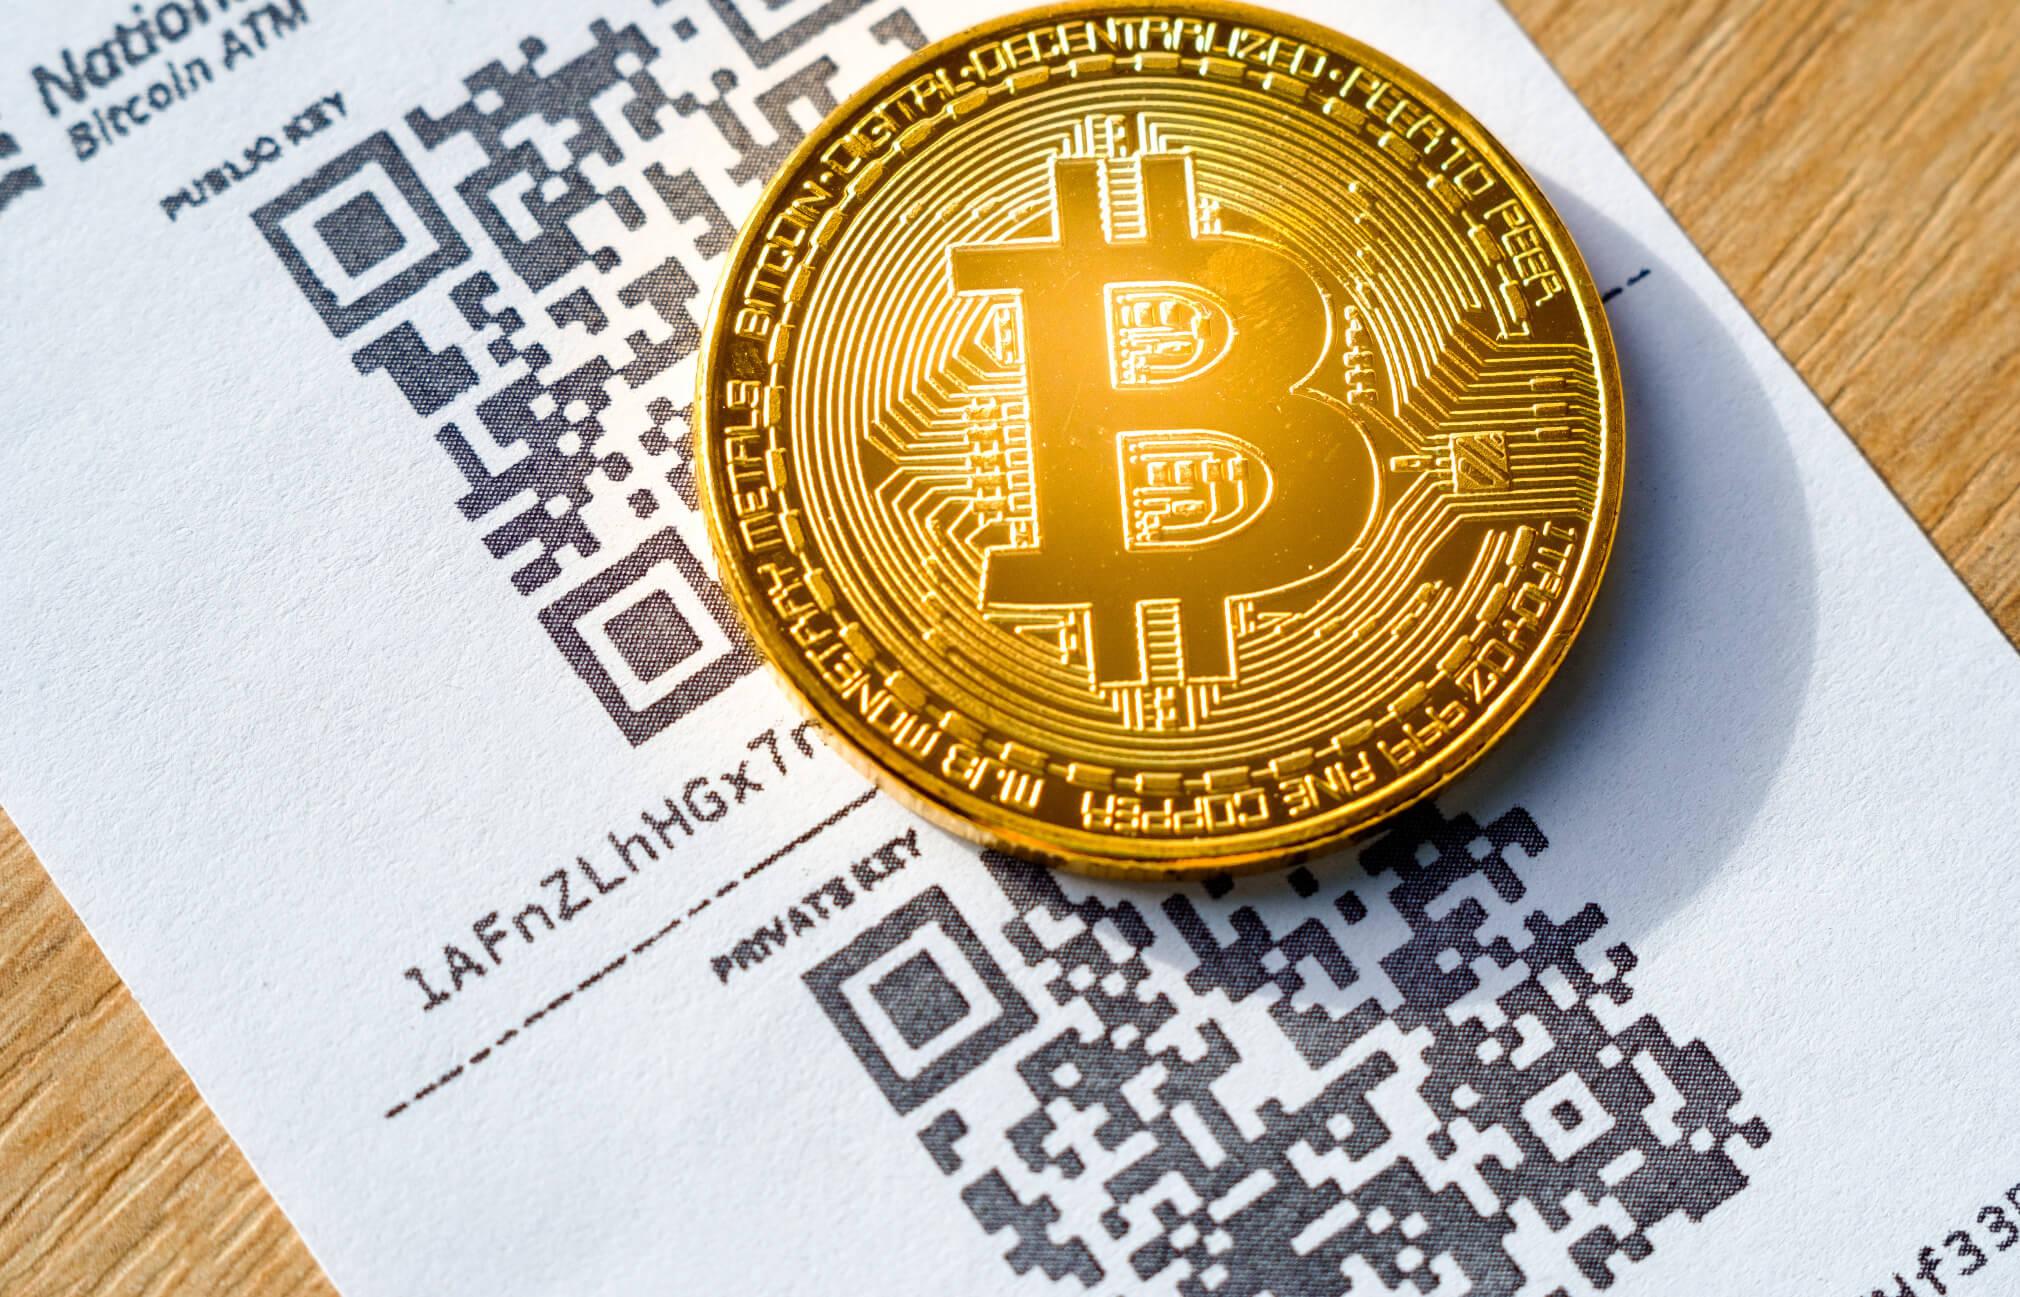 Bitcoin ATM Boom, OKEx's Lightning, India's Blockchain Plan + More News